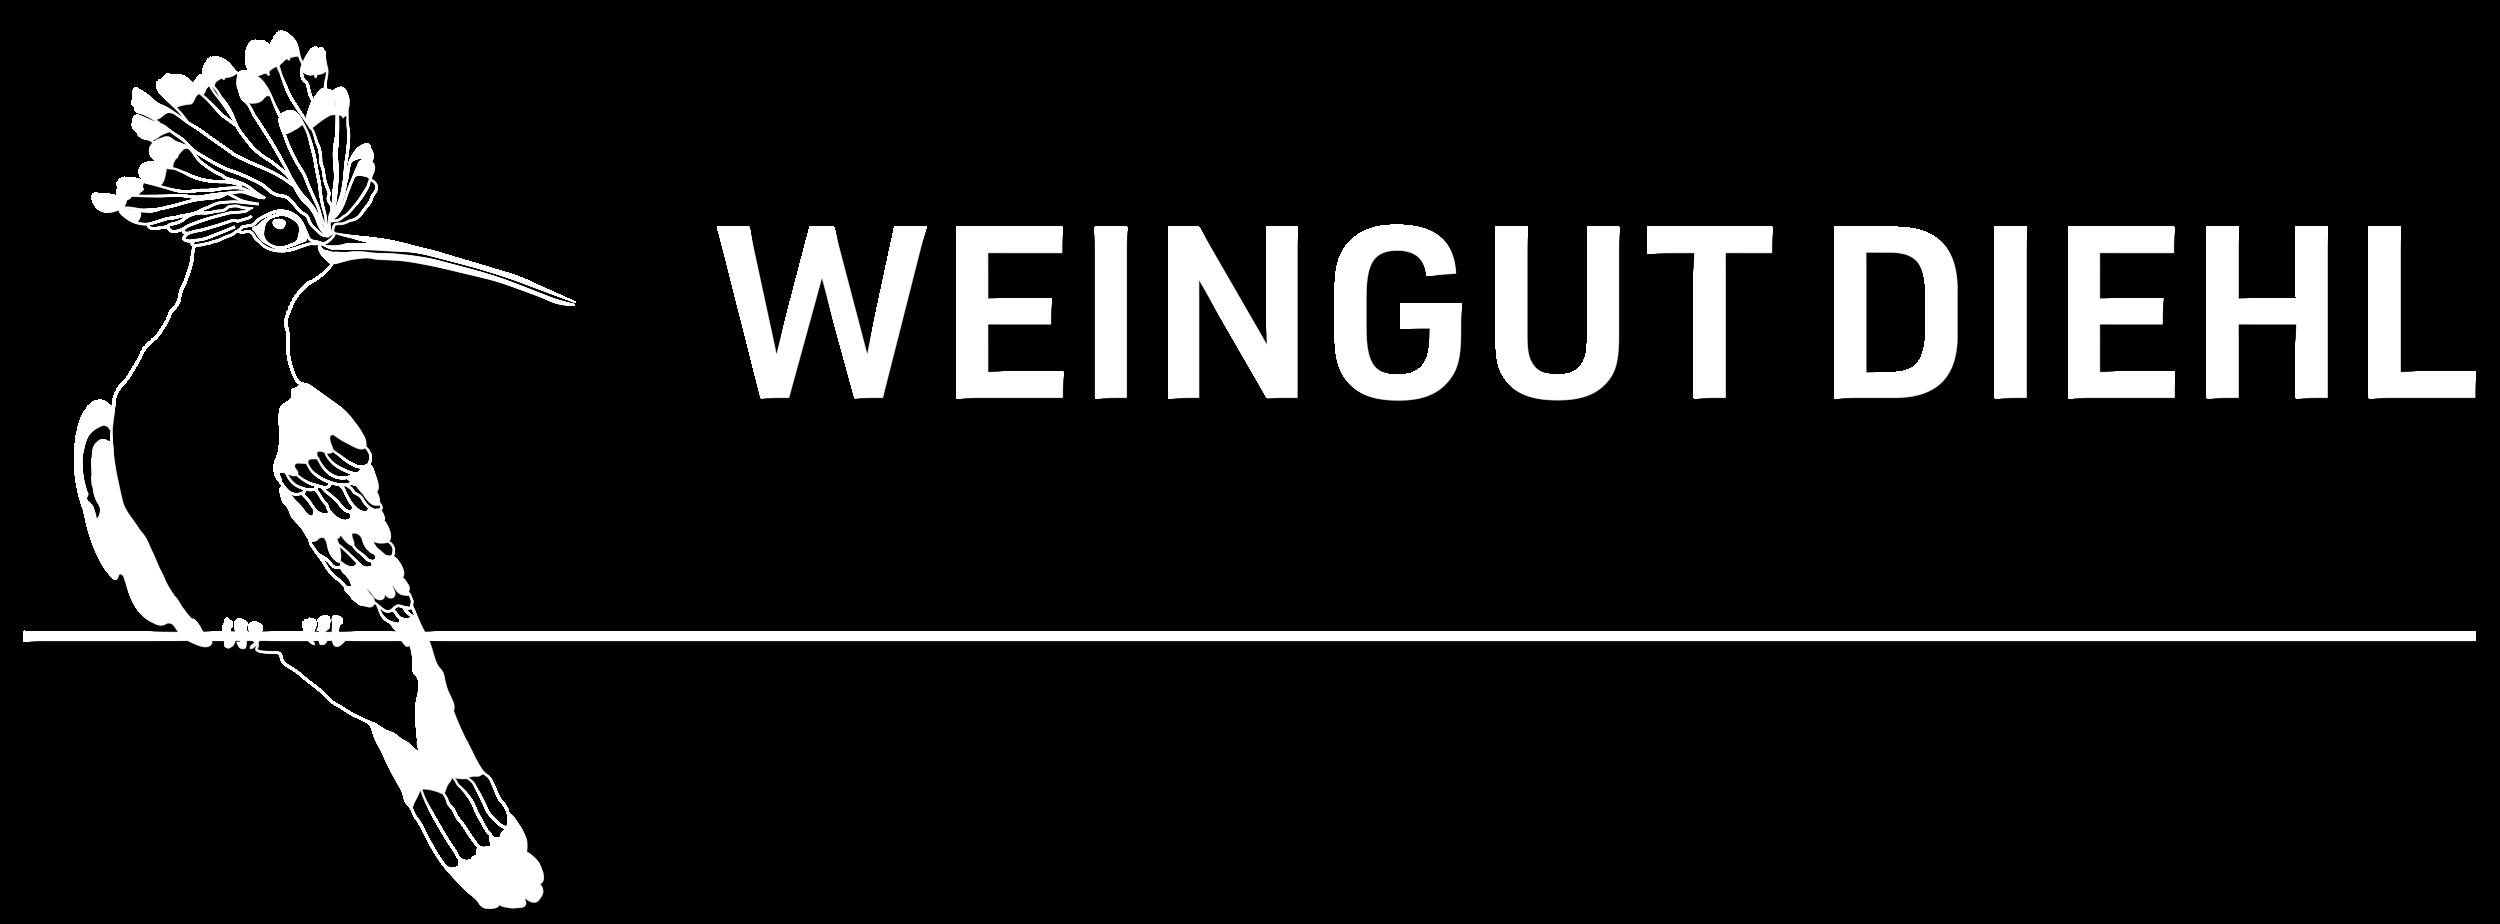 Wiedehopfweingutwebsite_weiss_schattenAuge-li.png